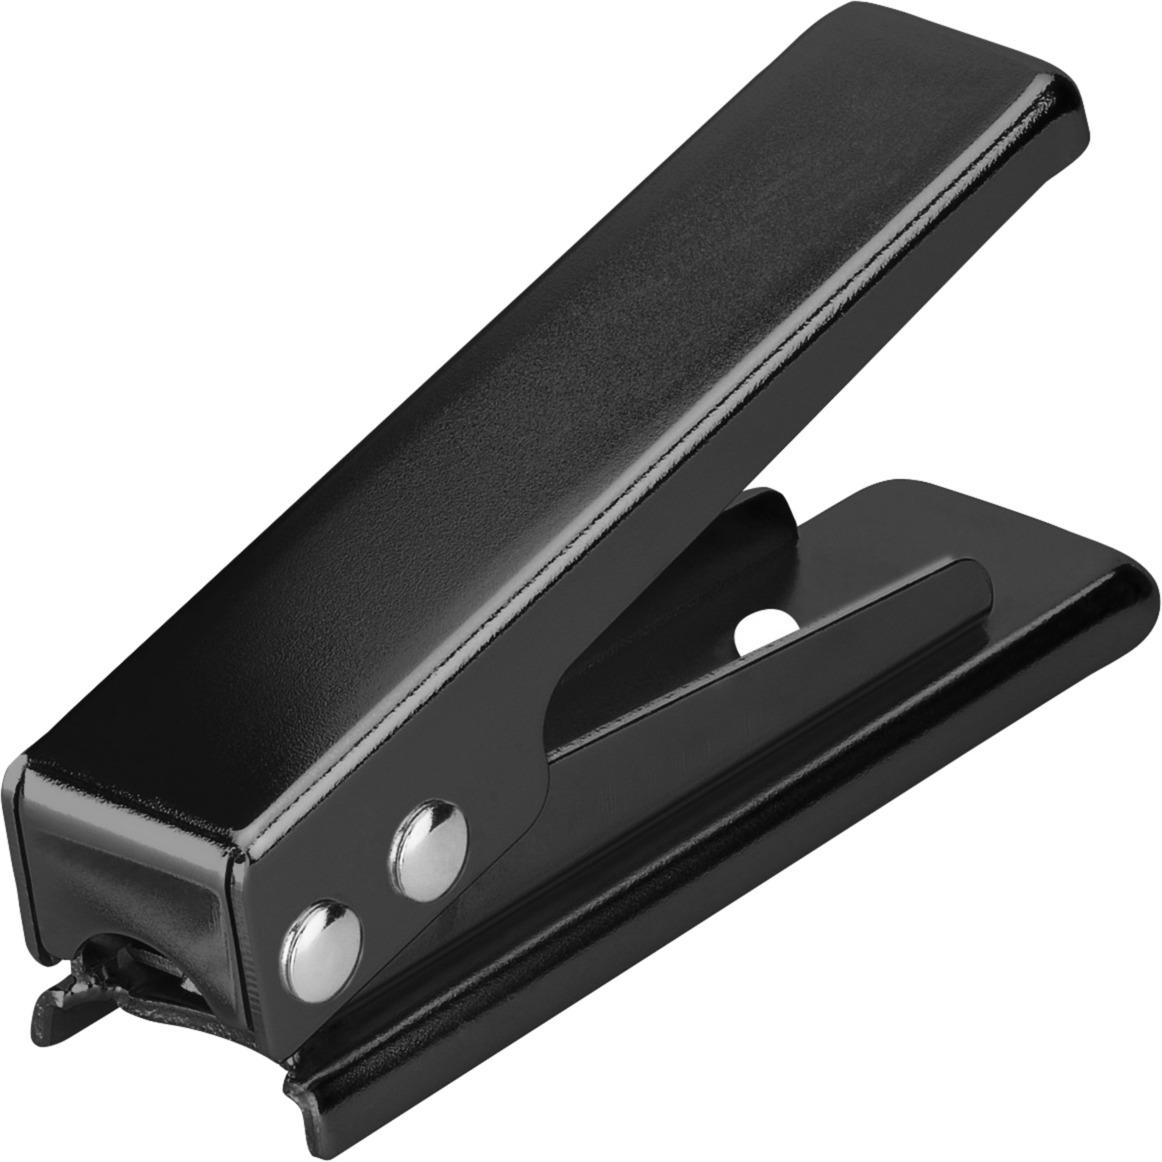 47011 adaptador para tarjeta de memoria sim / flash SIM card adapter, Dispositivo de corte